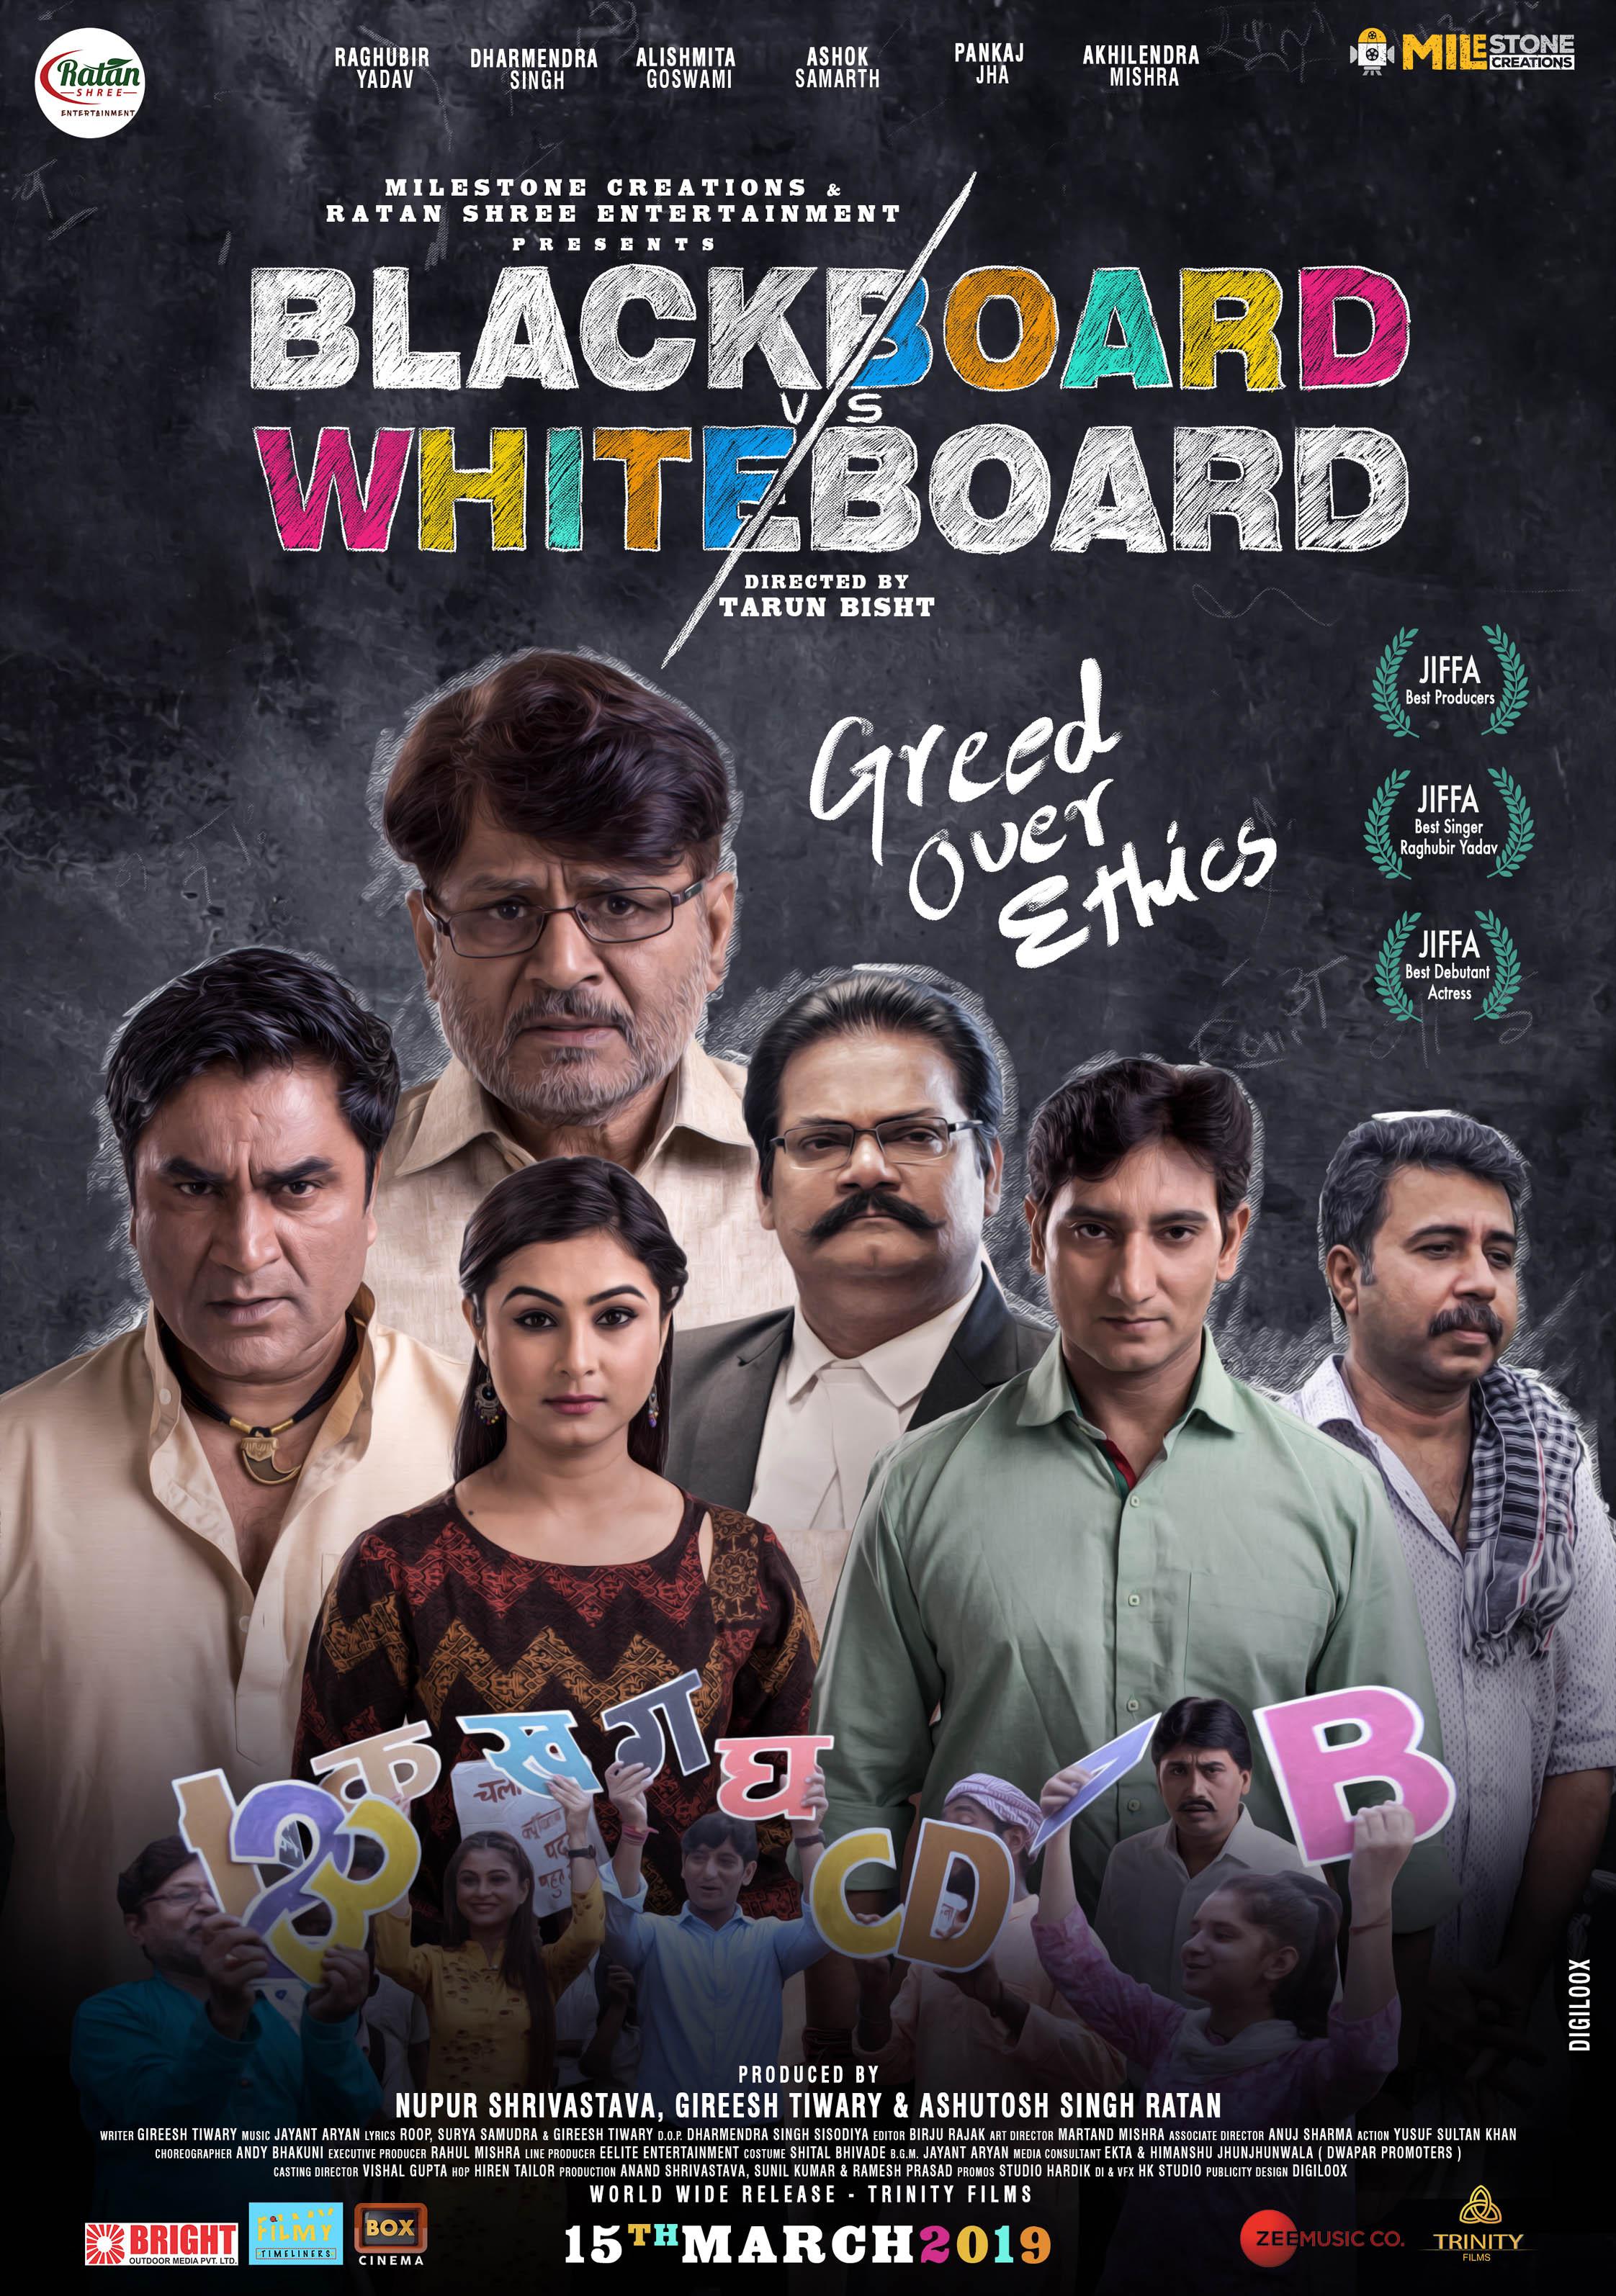 Raghubir Yadav's Hindi film Blackboard v/s Whiteboard releasing on 15th March